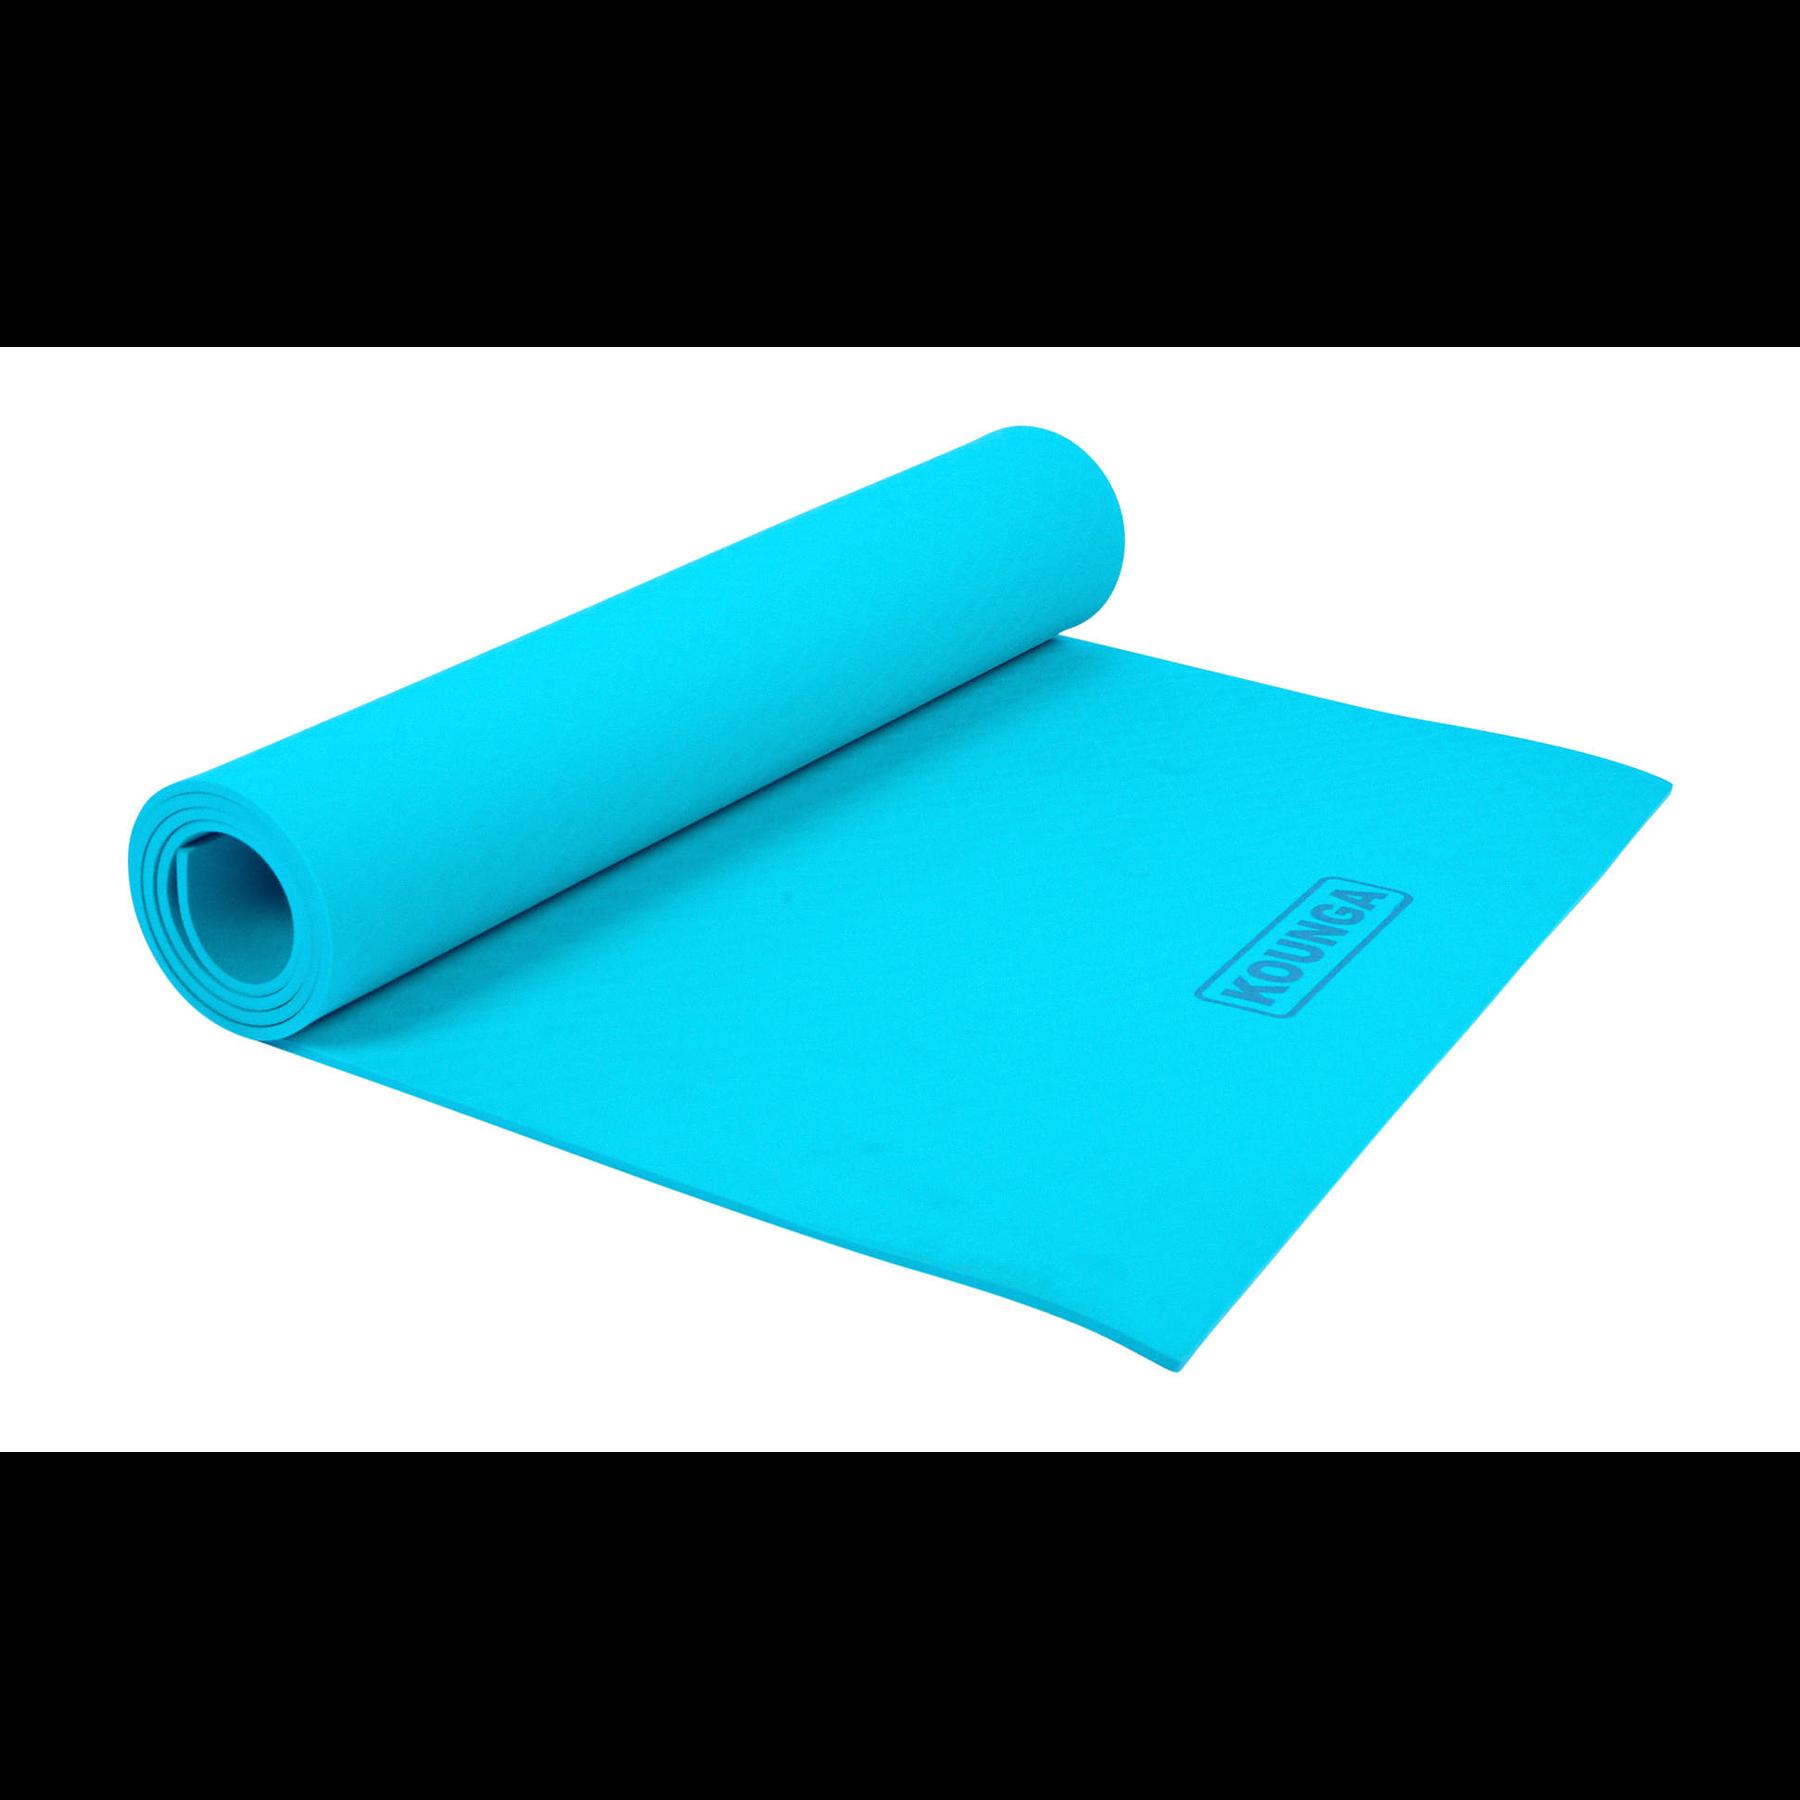 Mat de Yoga Kounga 5mm para Niños TPE con correa para transportar